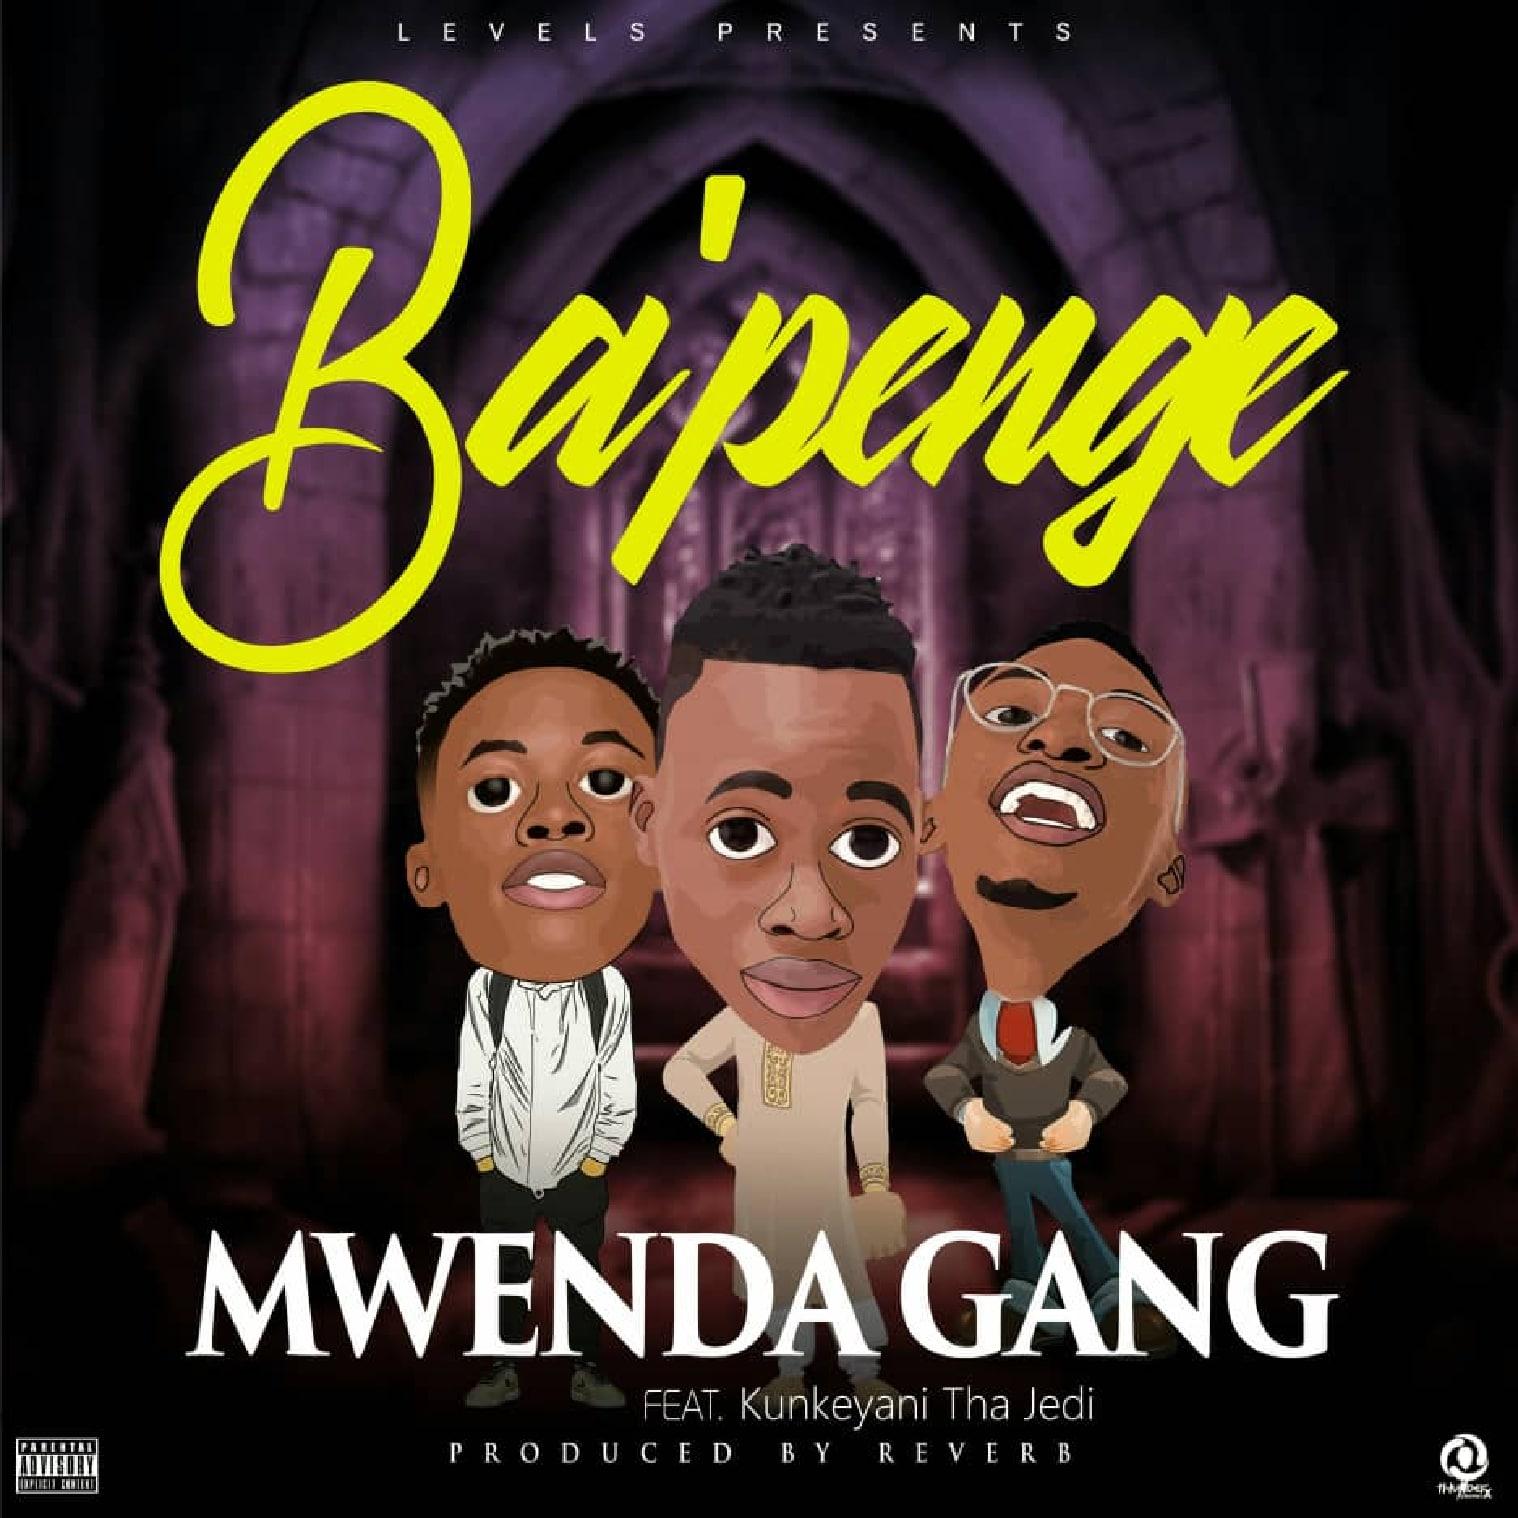 Mwenda Gang Ft. Kunkeyani Tha Jedi Bapenge